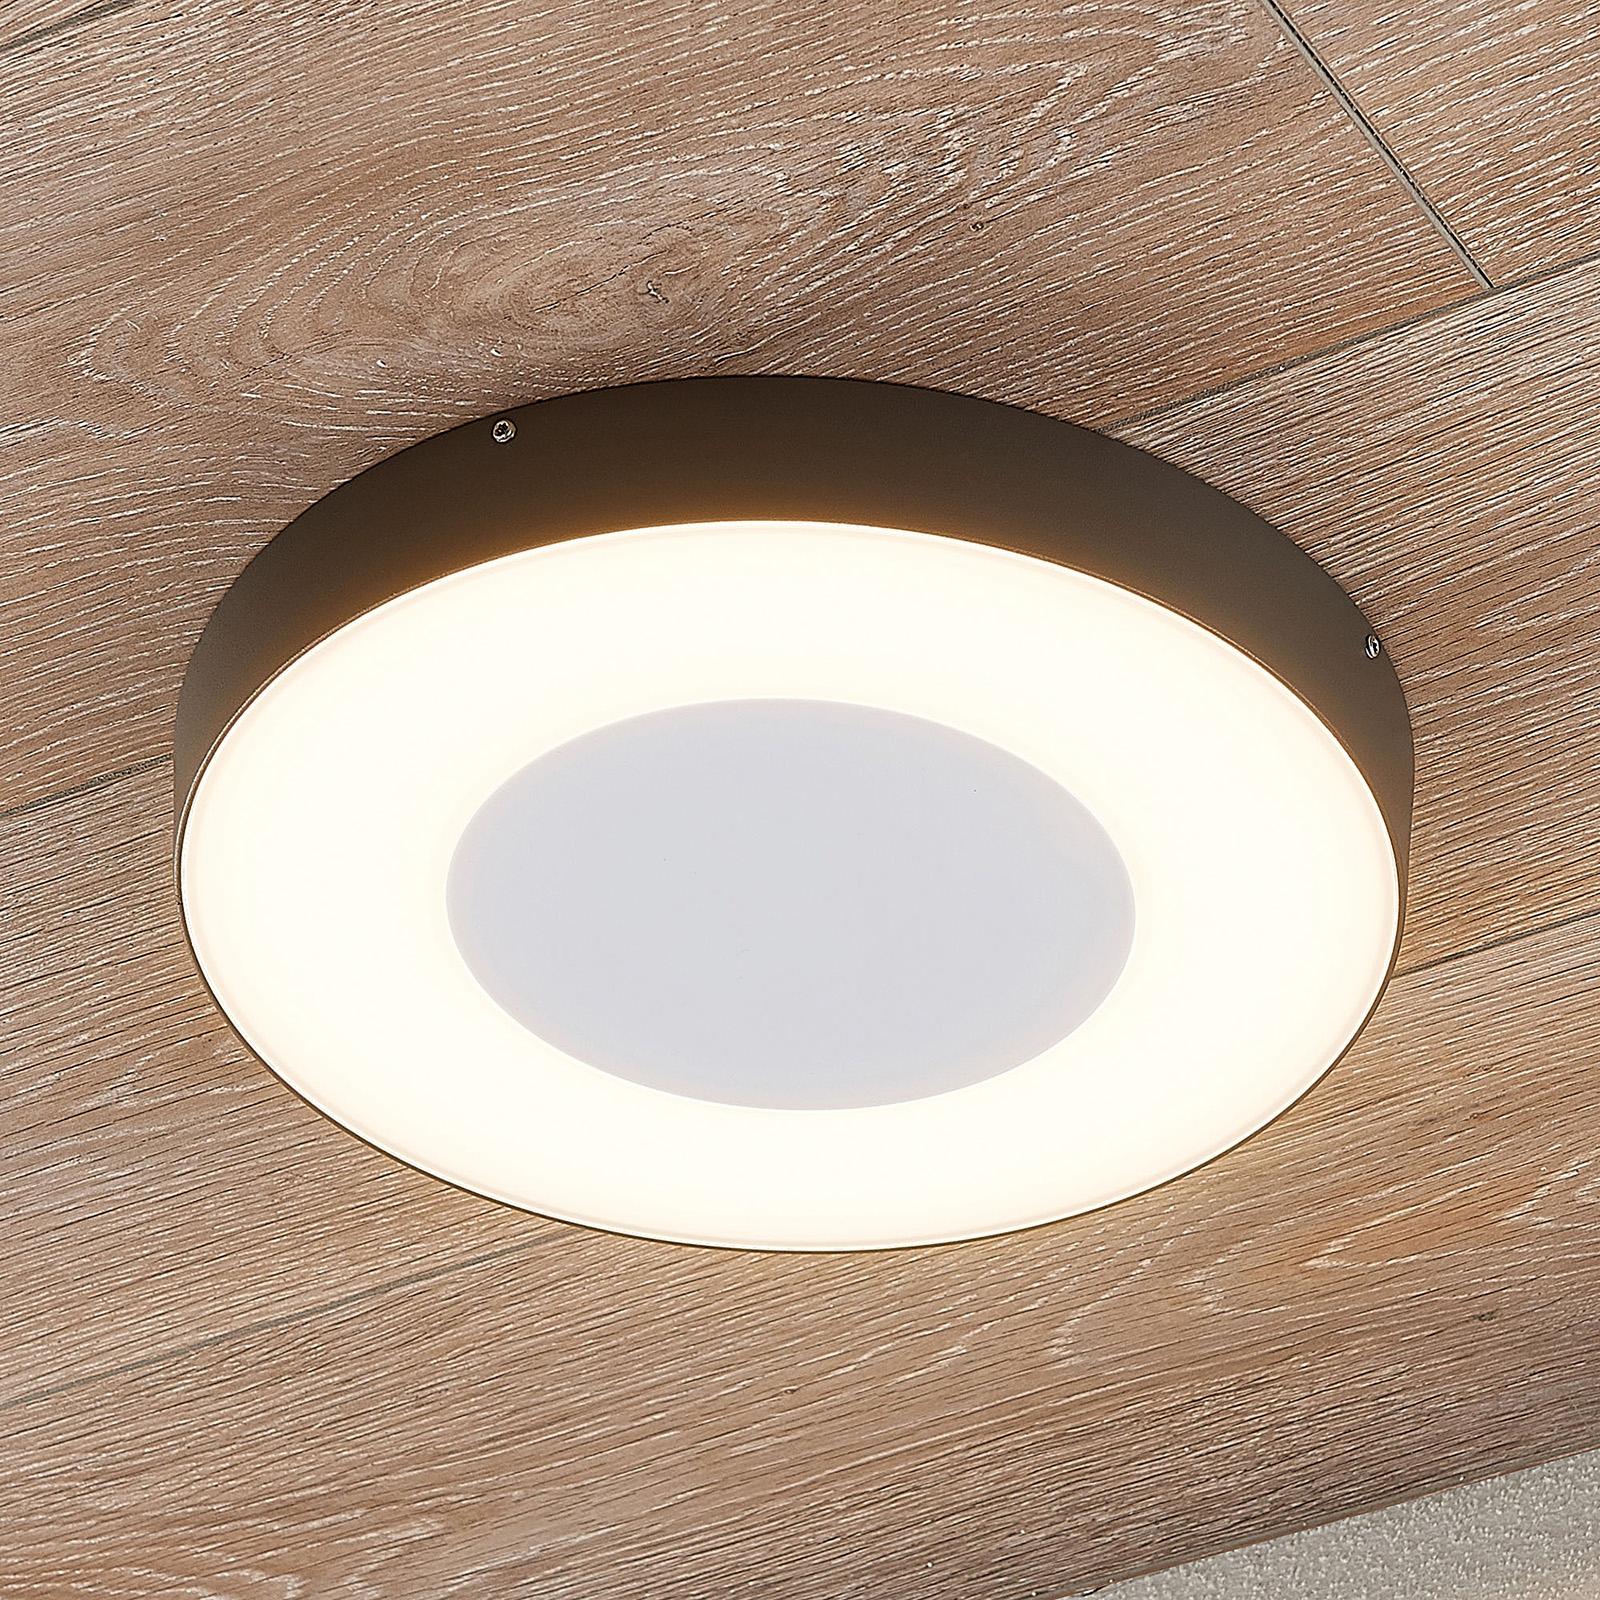 Lampa sufitowa LED Sora, okrągła